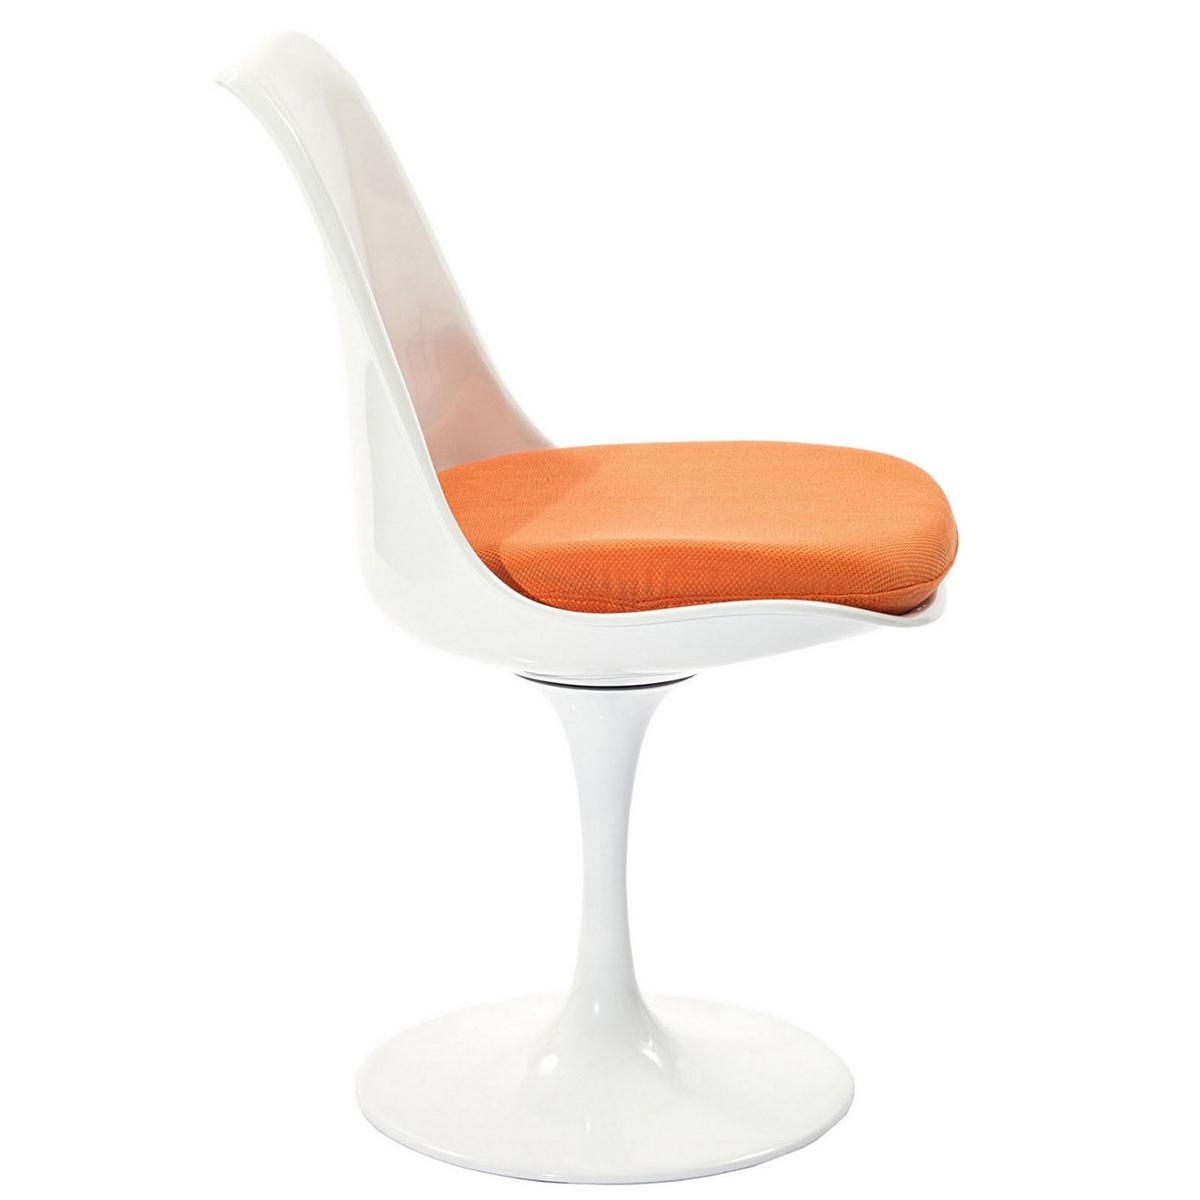 Modway Lippa Dining Side Chair Fabric Set of 4 - Orange